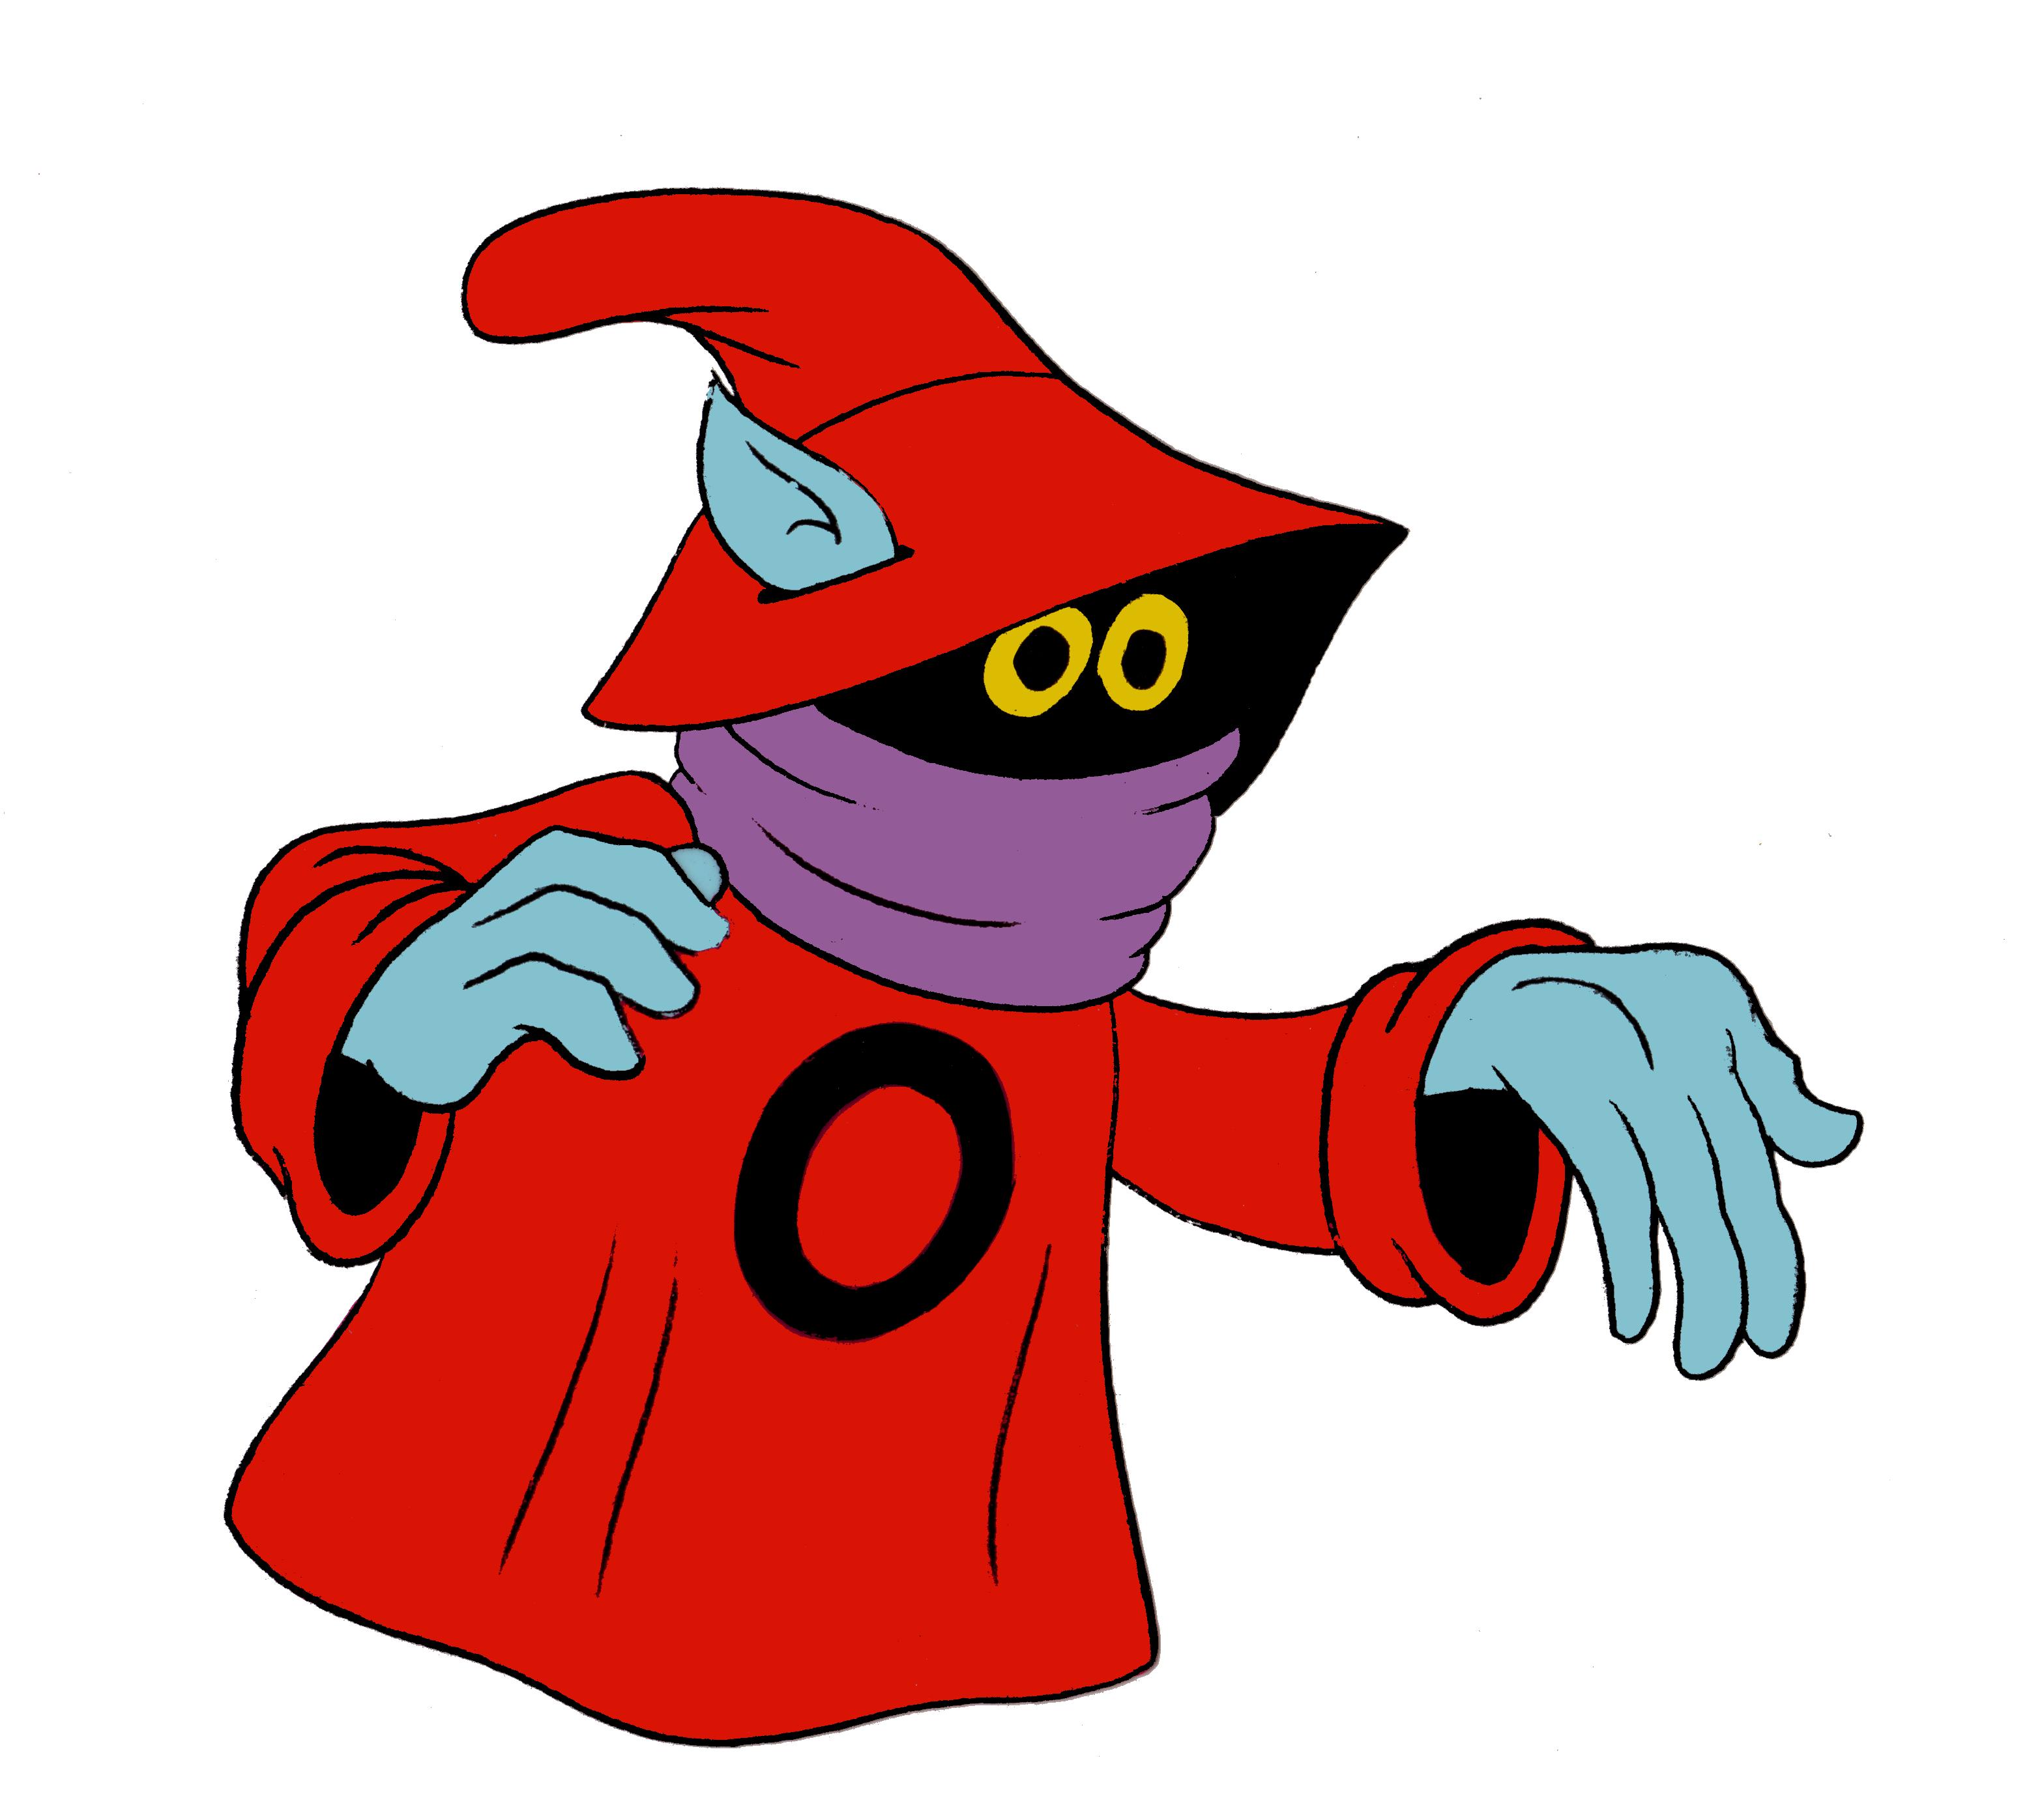 Orko 2002